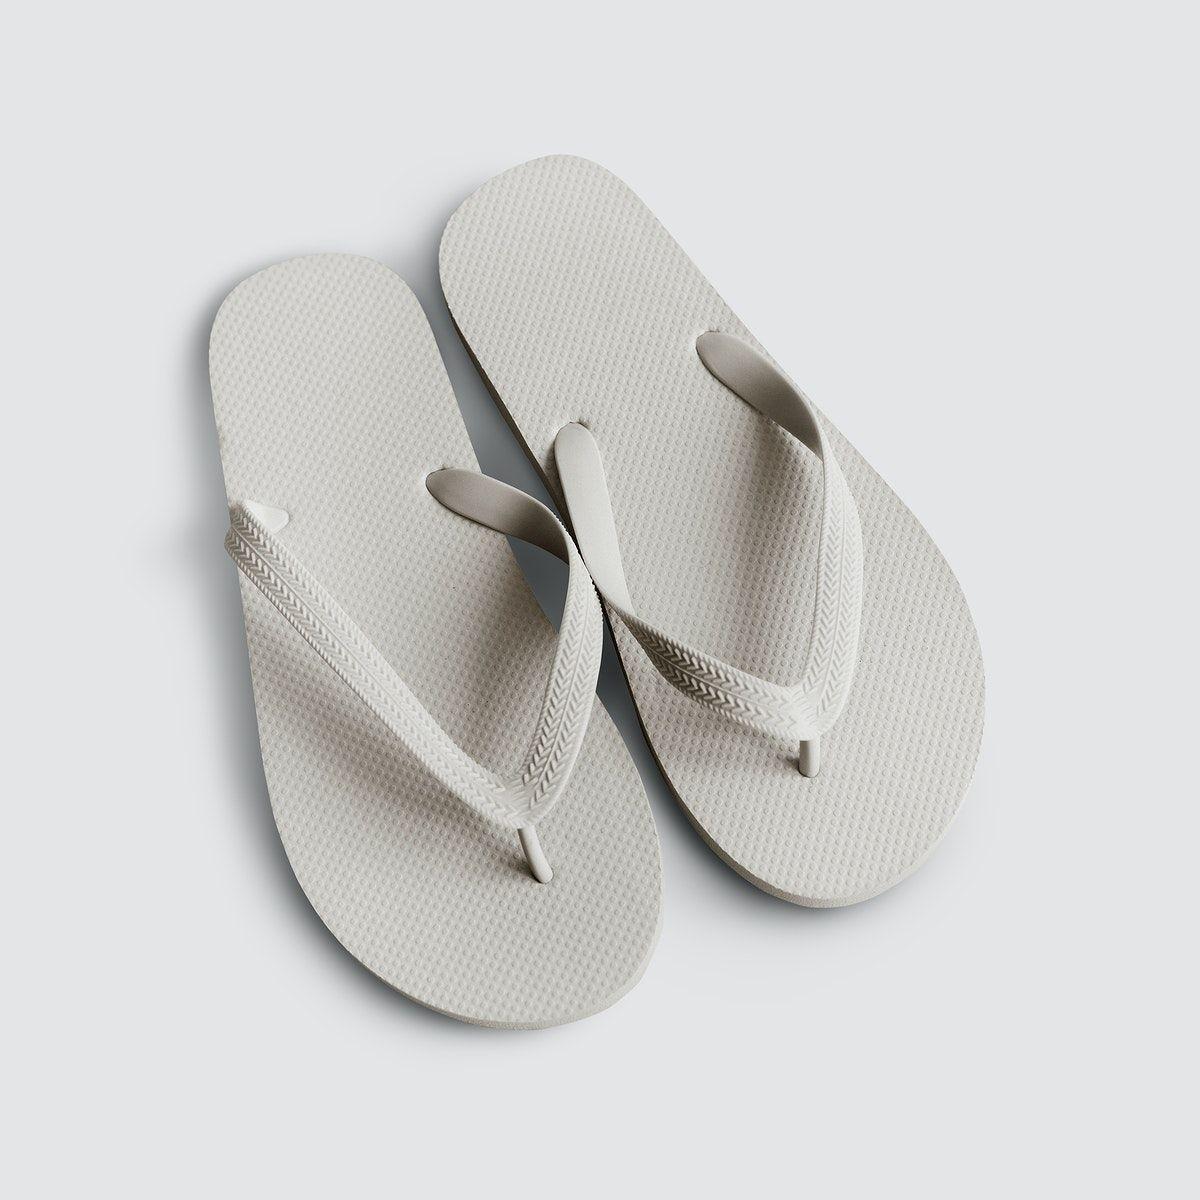 Download Premium Illustration Of Flip Flop Psd Summer Beach Slippers Beach Slippers Flip Flops Flop